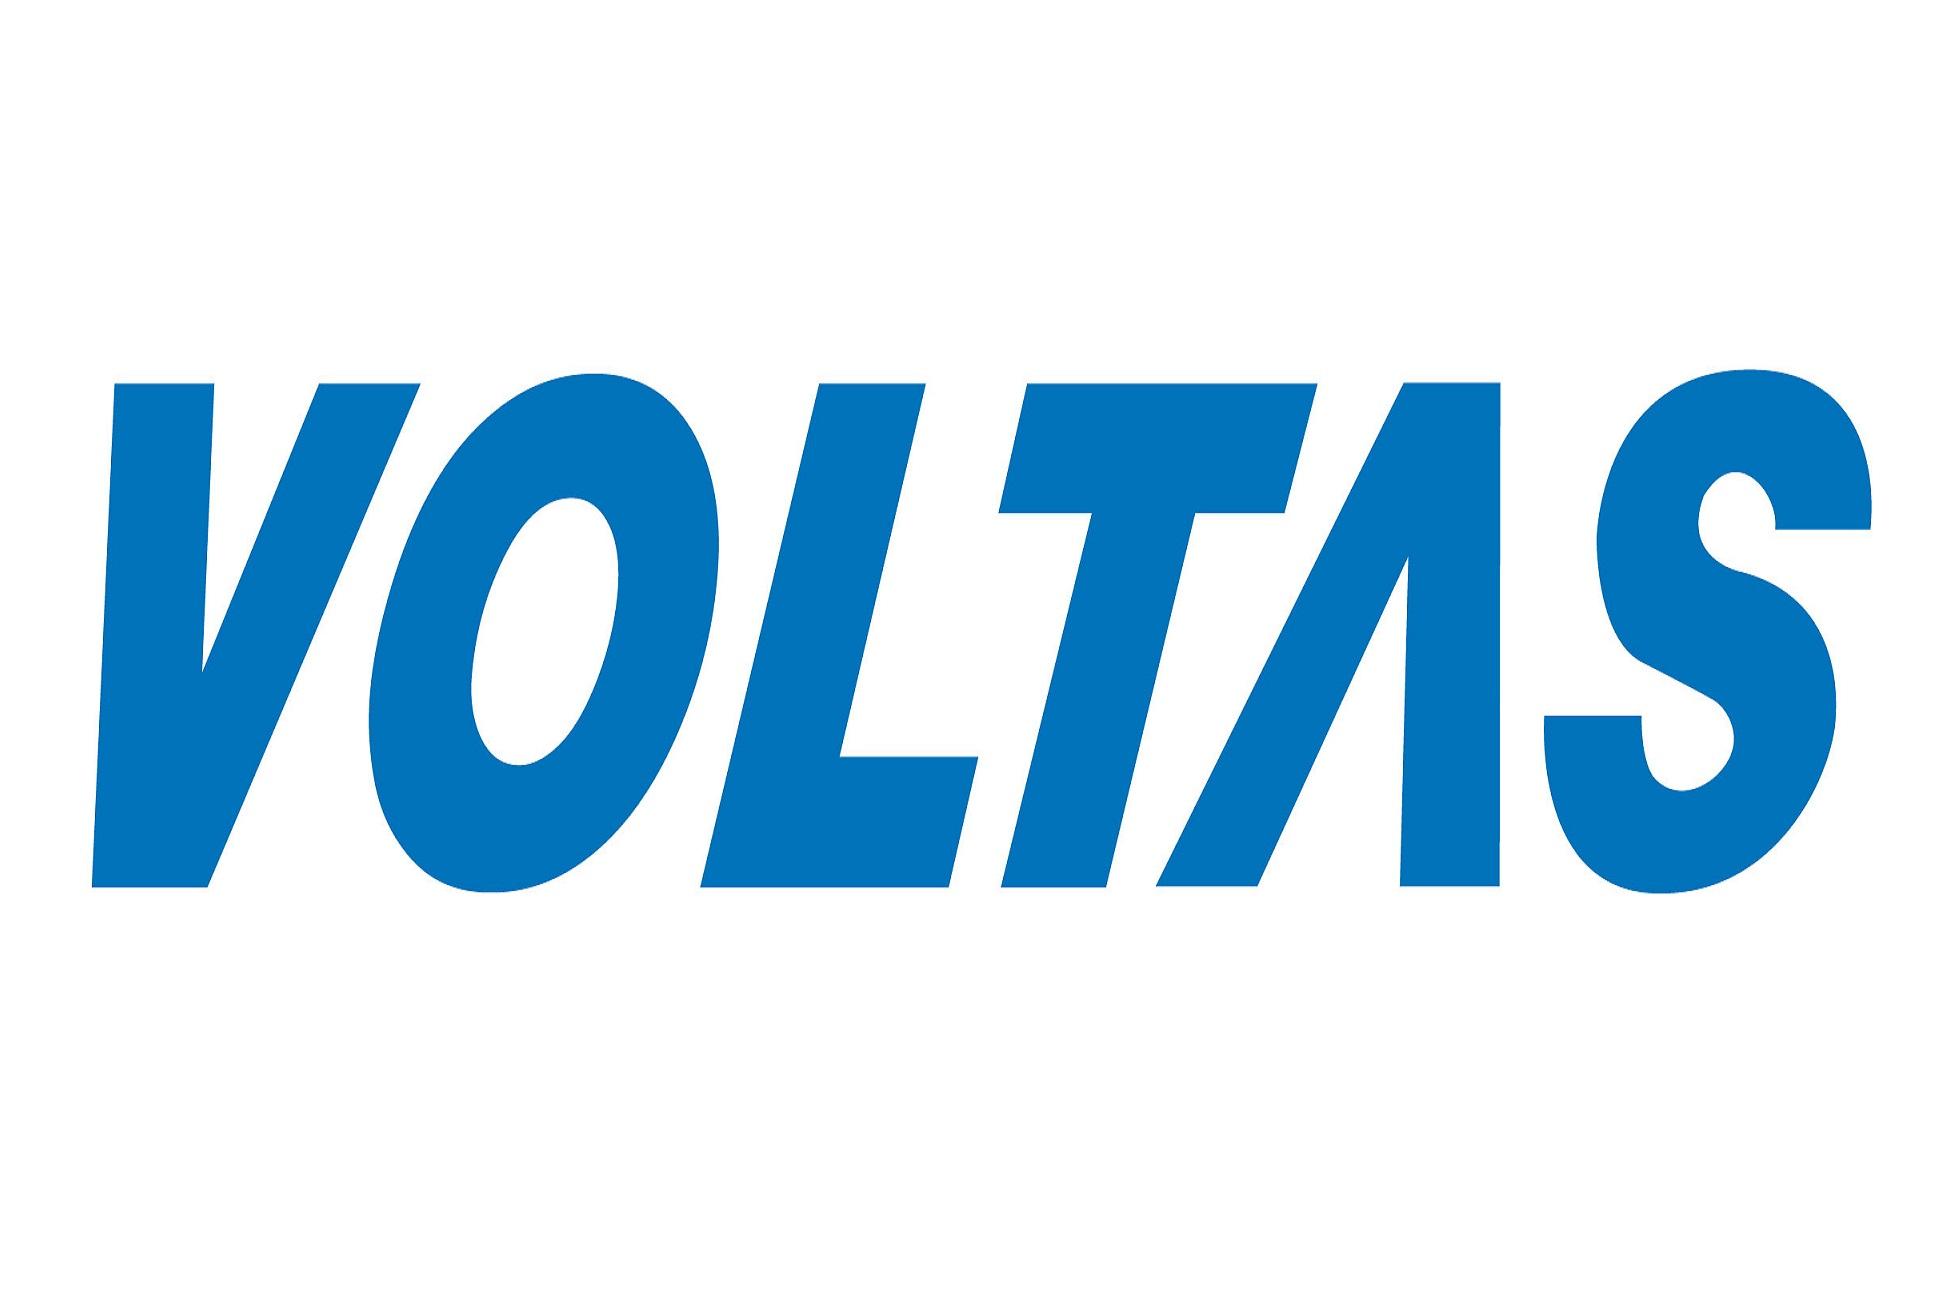 Voltas 183PX-S 1.5 Ton 3 Star Split AC Image